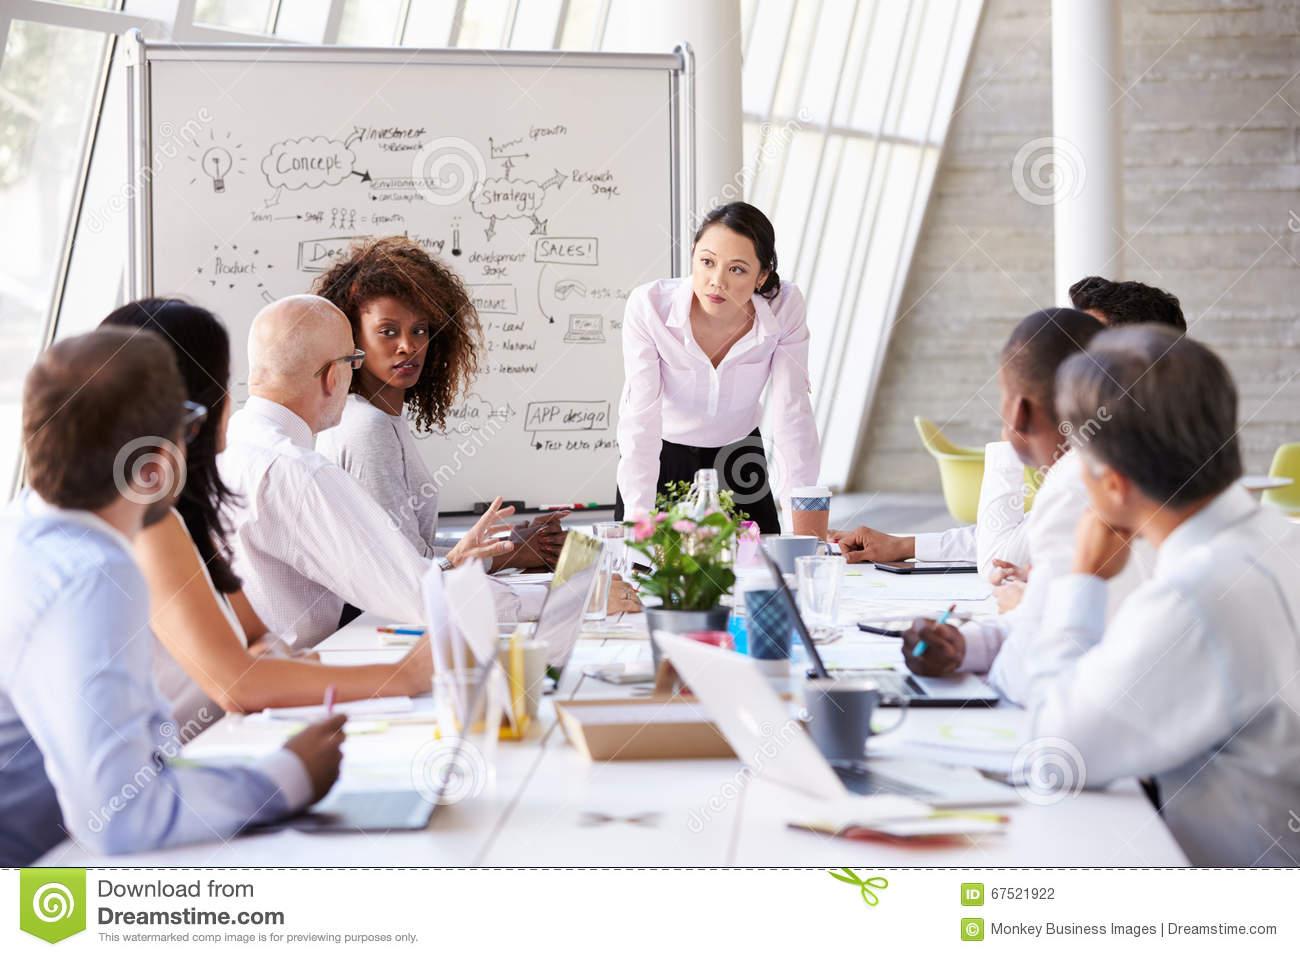 asian-businesswoman-leading-meeting-boardroom-table-67521922.jpg